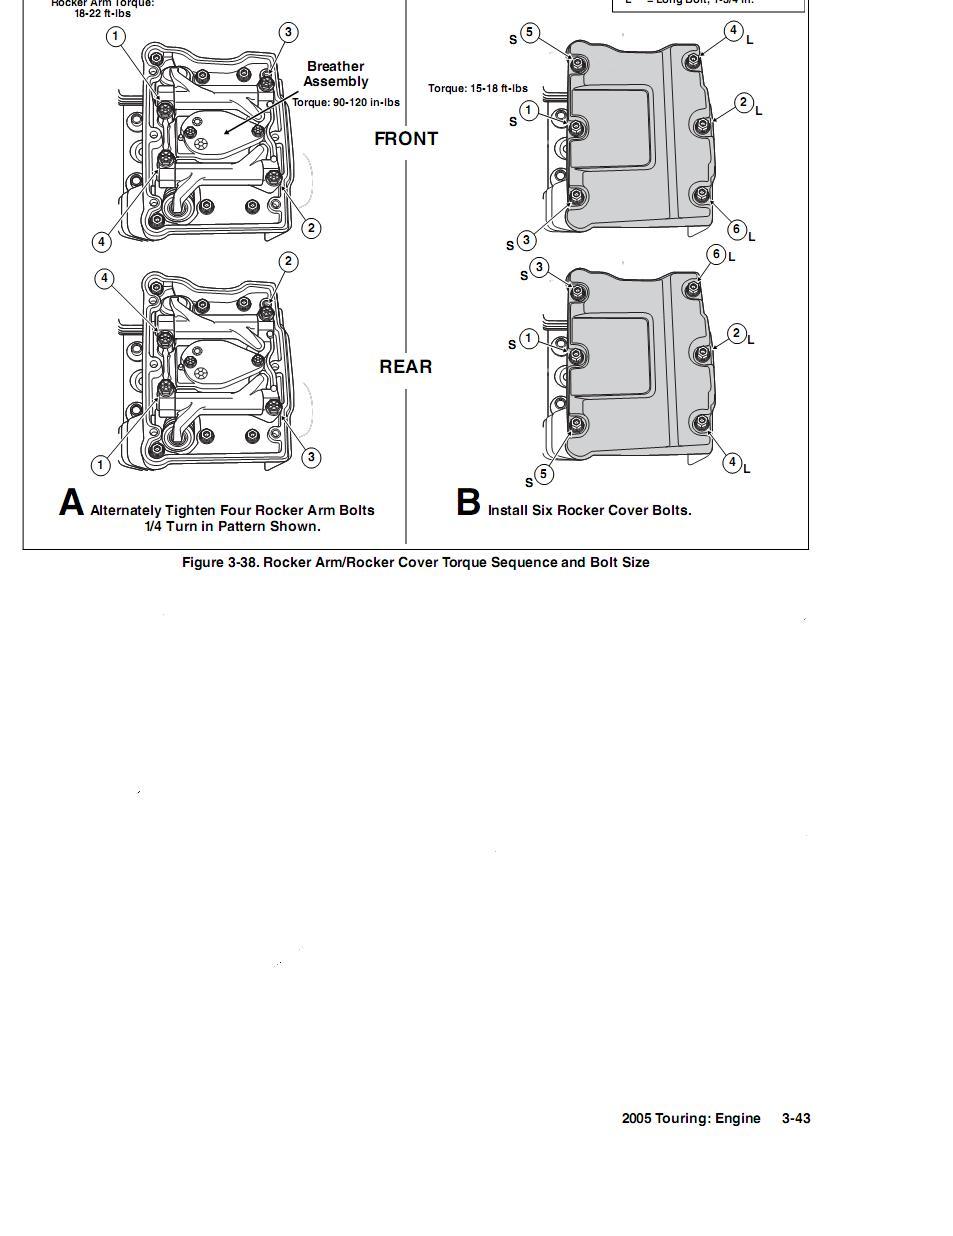 HARLEY DAVIDSON ENGINE DIMENSION DIAGRAM - Auto Electrical ...